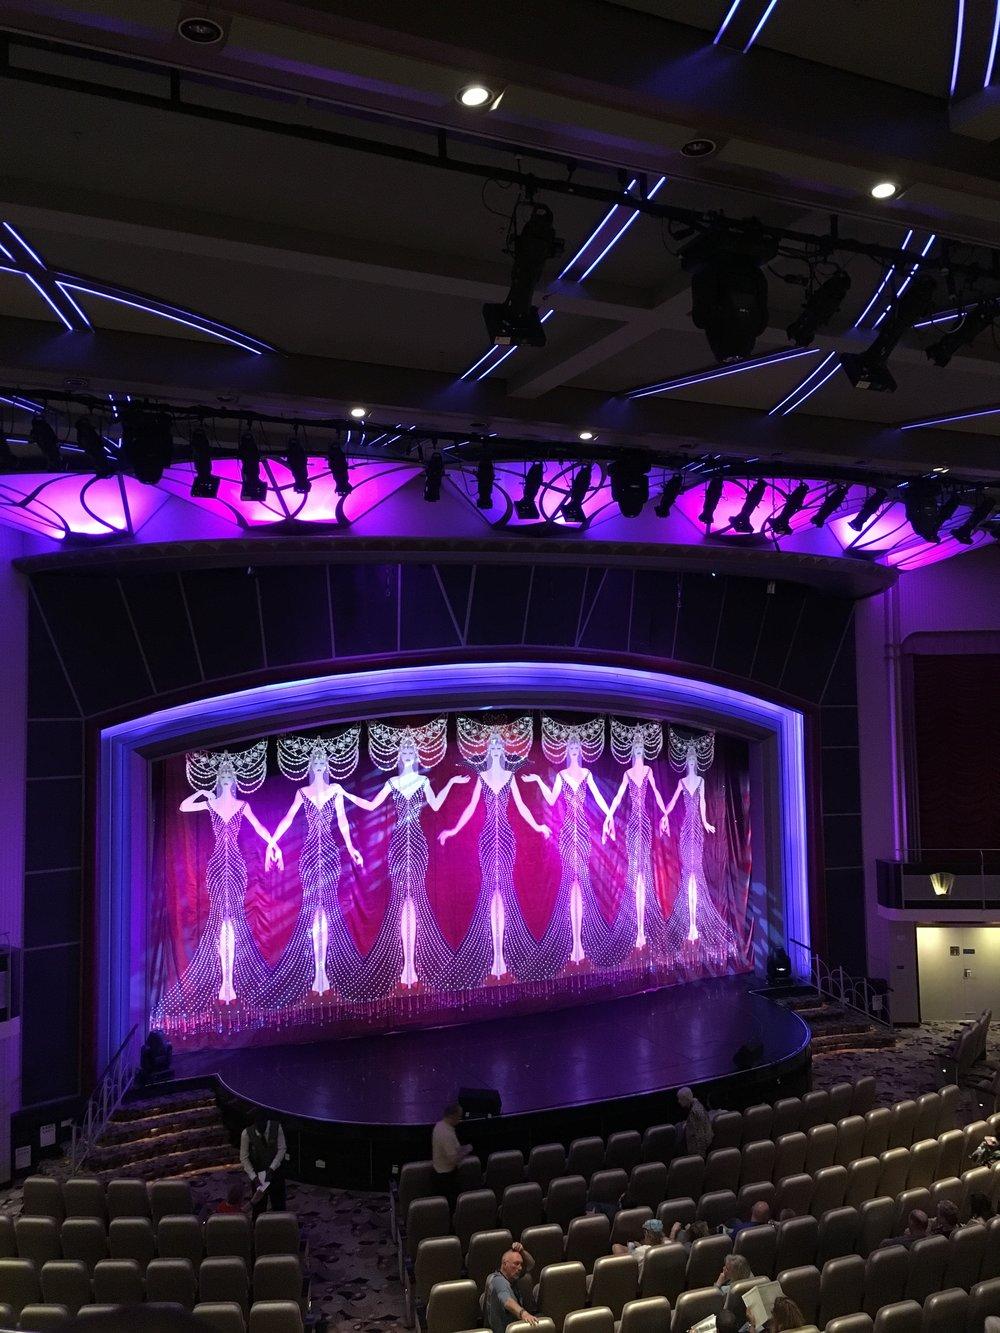 Platinum Theater decks 3 and 4 (k klofft)